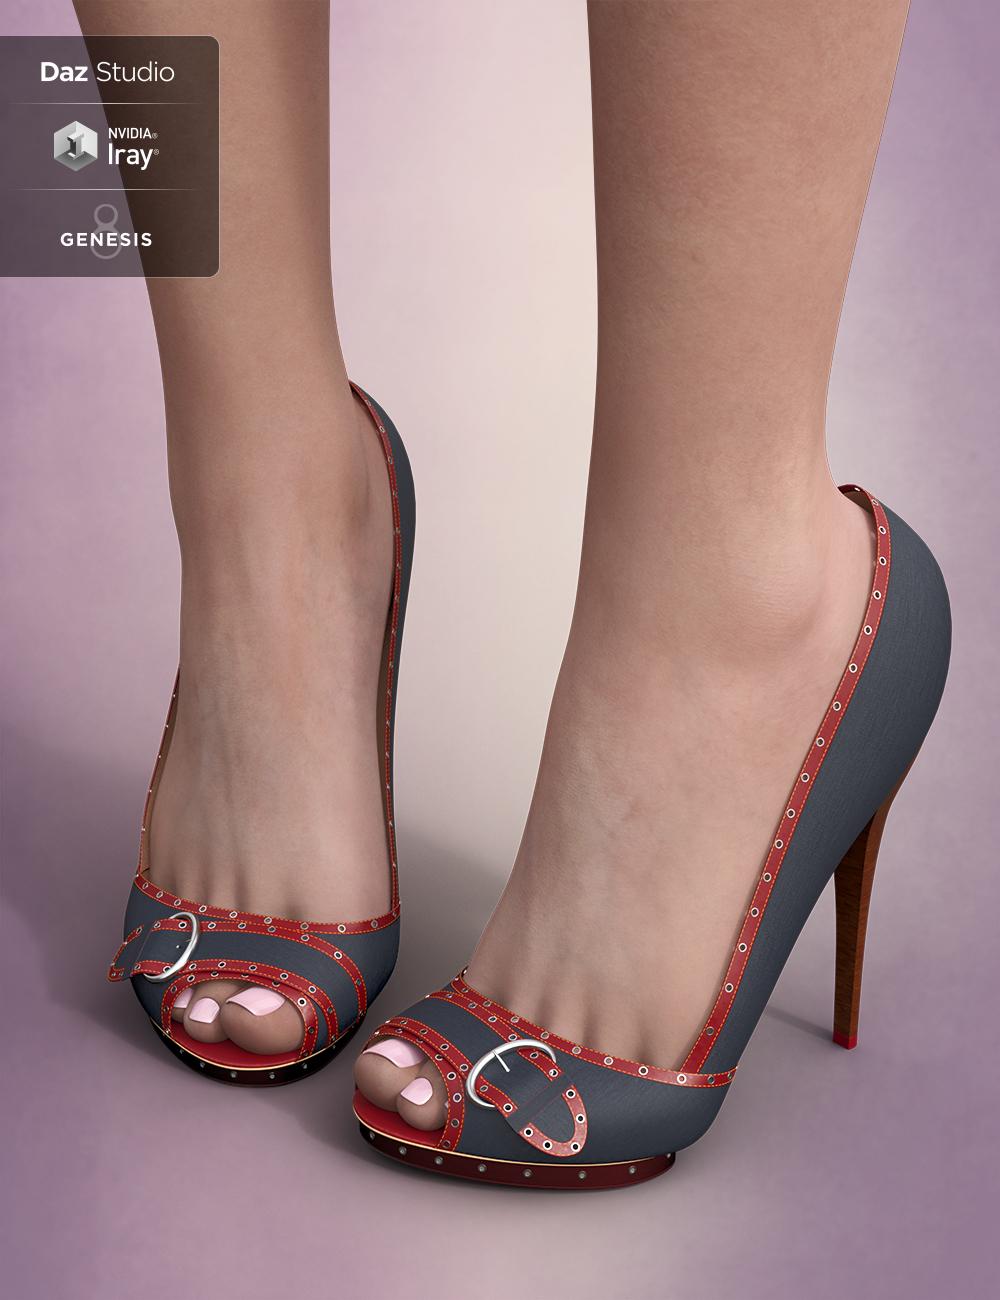 Seductive High Heels for Genesis 8 Female(s) by: PrefoX, 3D Models by Daz 3D